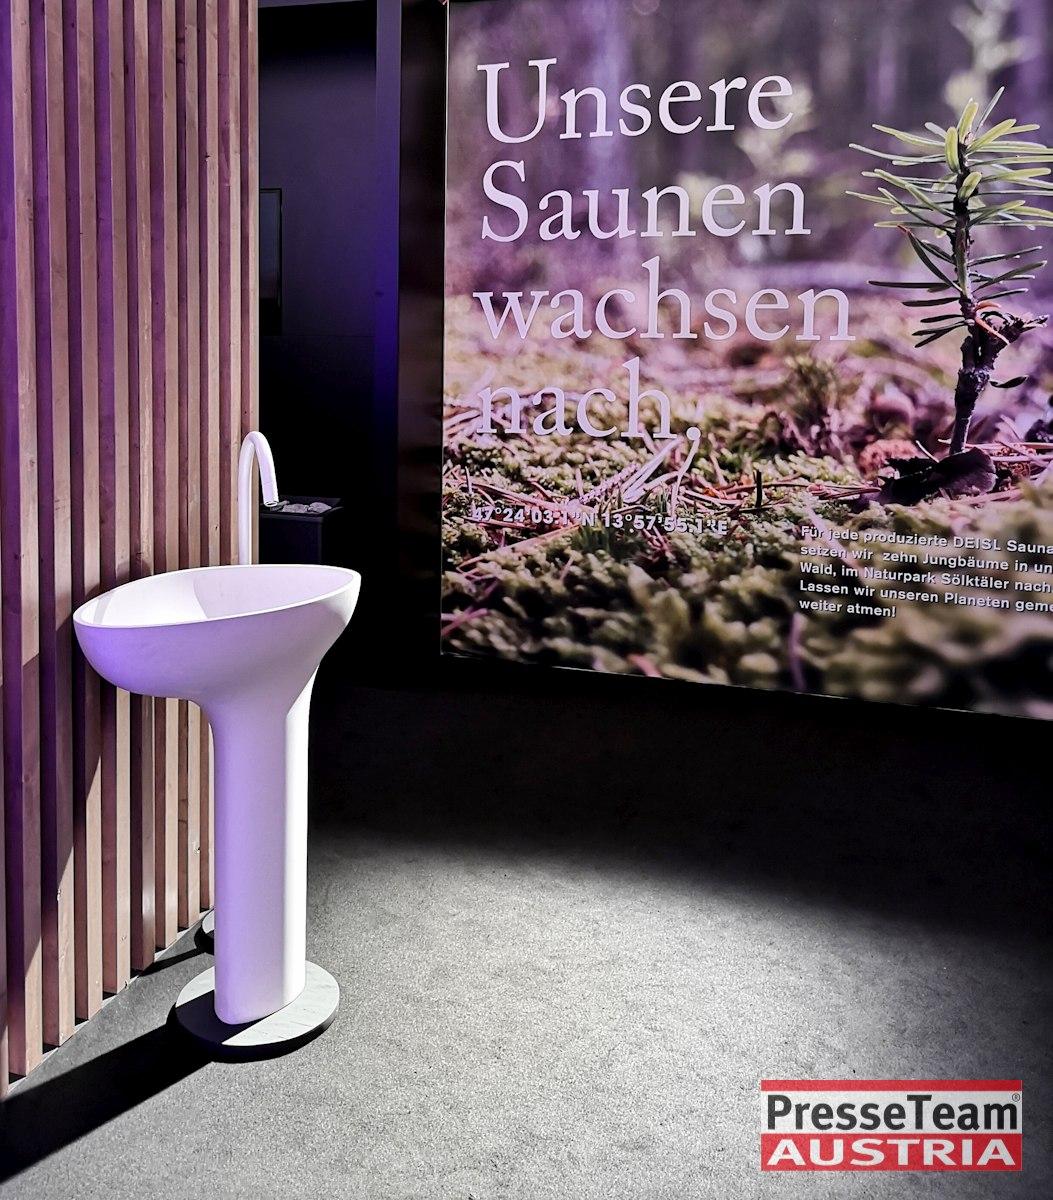 Messe Hofburg Wien 130 - Luxus Möbelmesse & Lifestyle in der Hofburg Wien